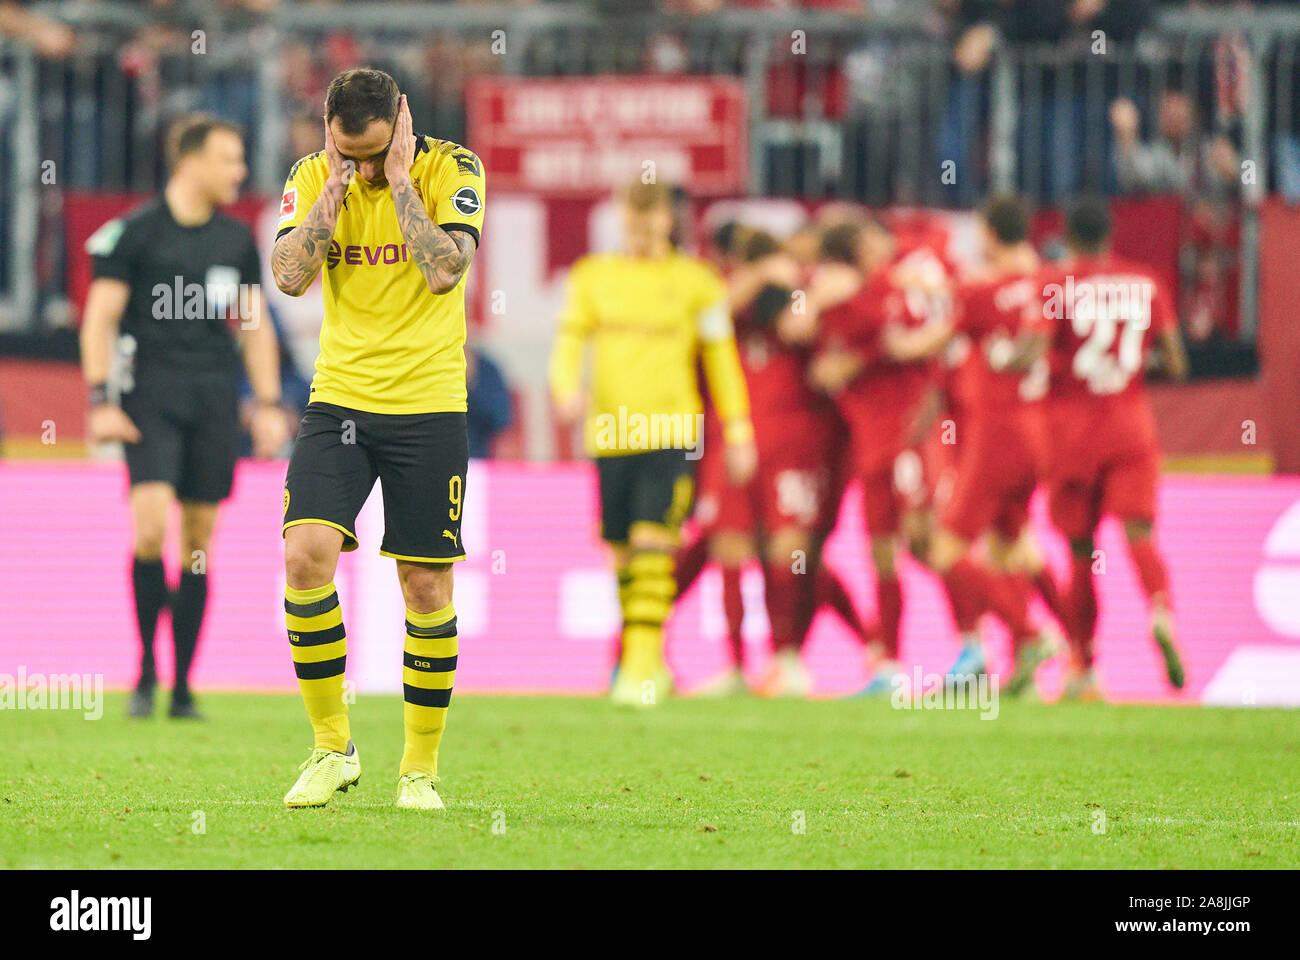 TICKET Supercup 2014 Borussia Dortmund Bayern München